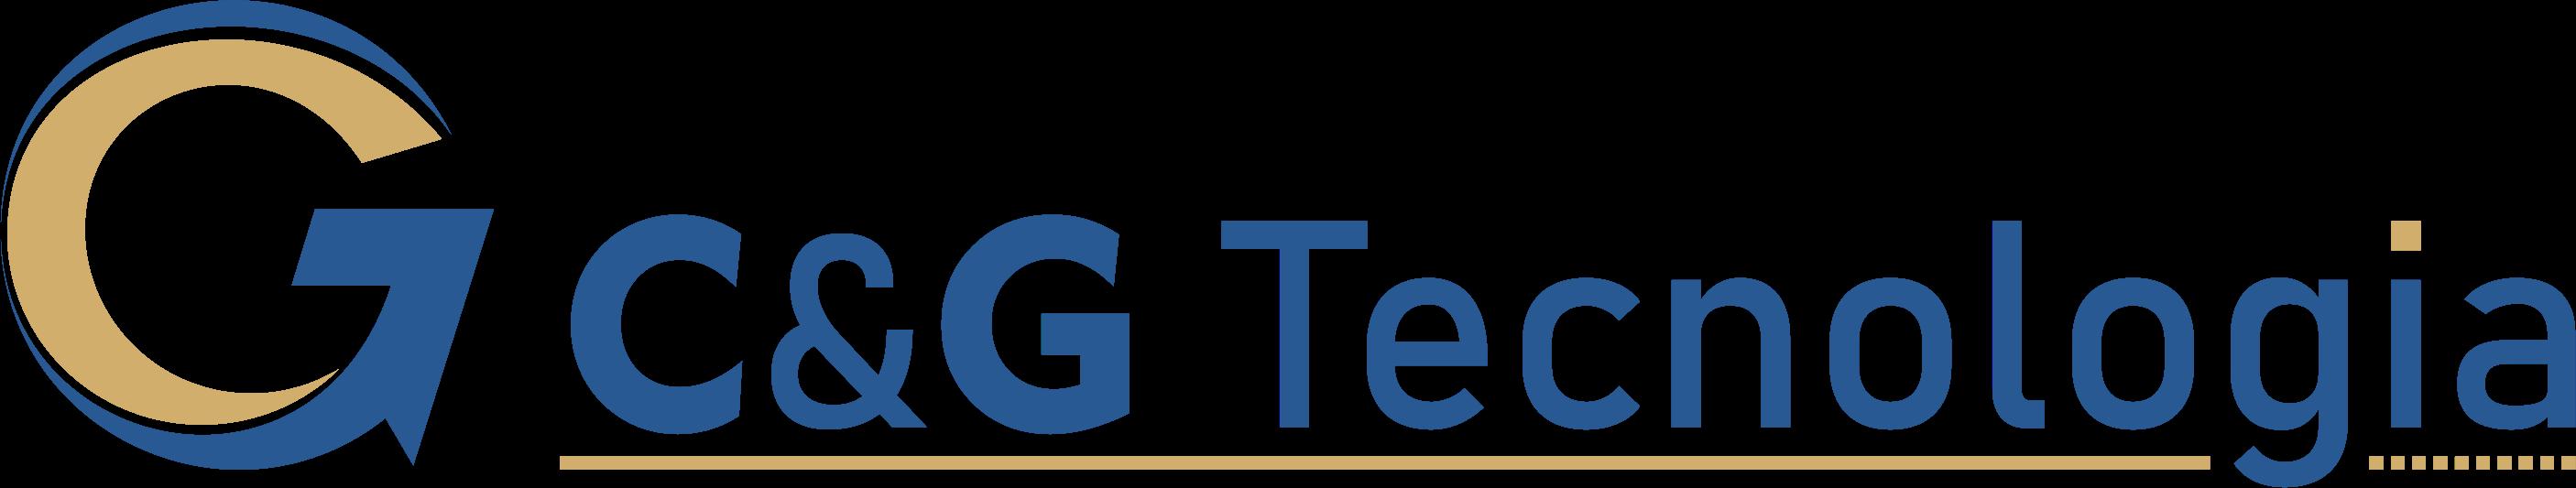 CG Tecnologia